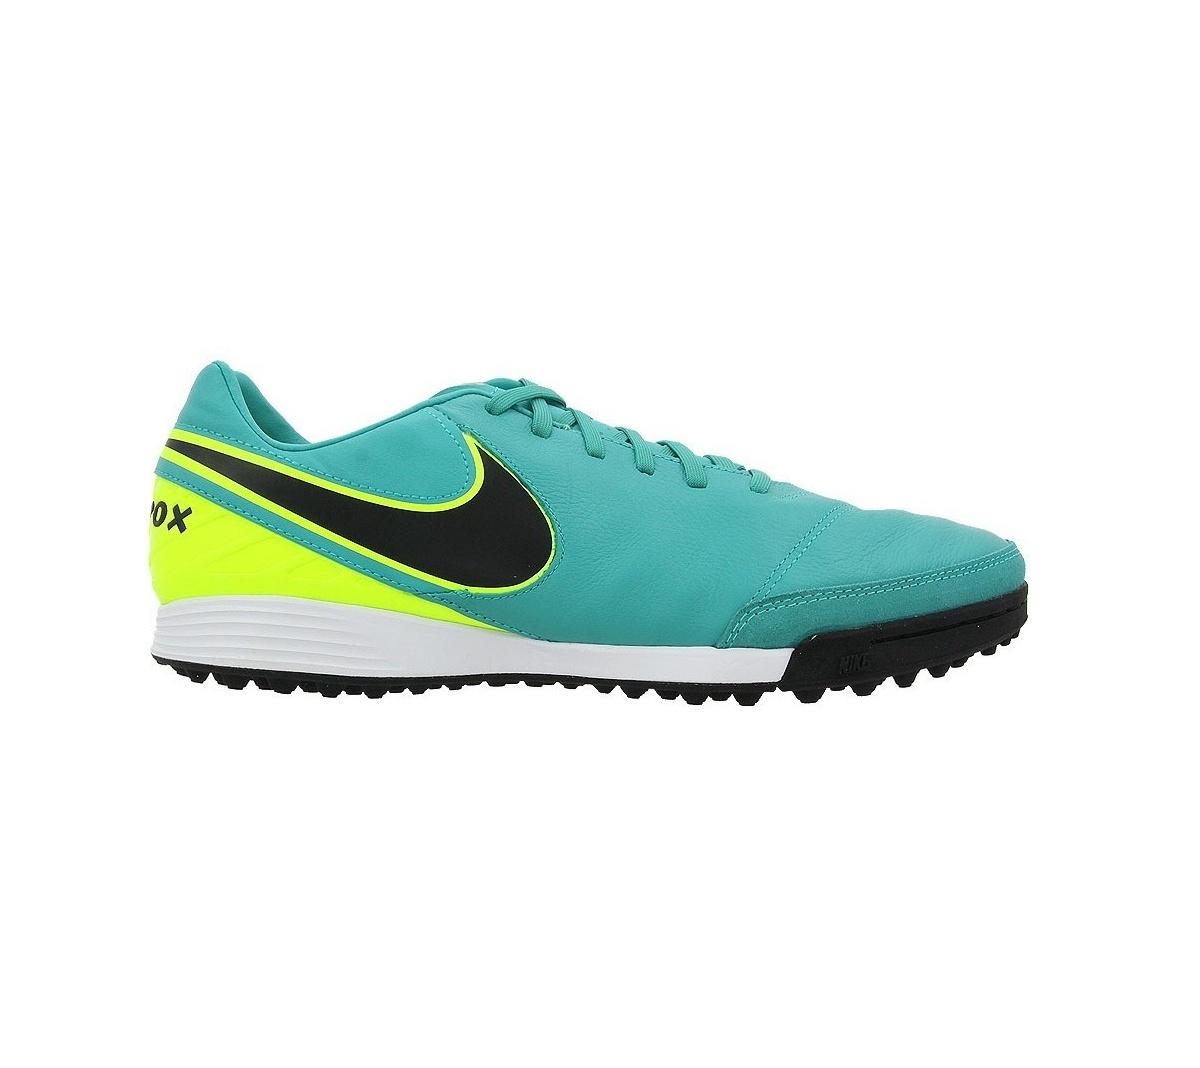 8095aea370ef3 Chuteira Nike Tiempo Mystic V Society Vd - Mundo do Futebol